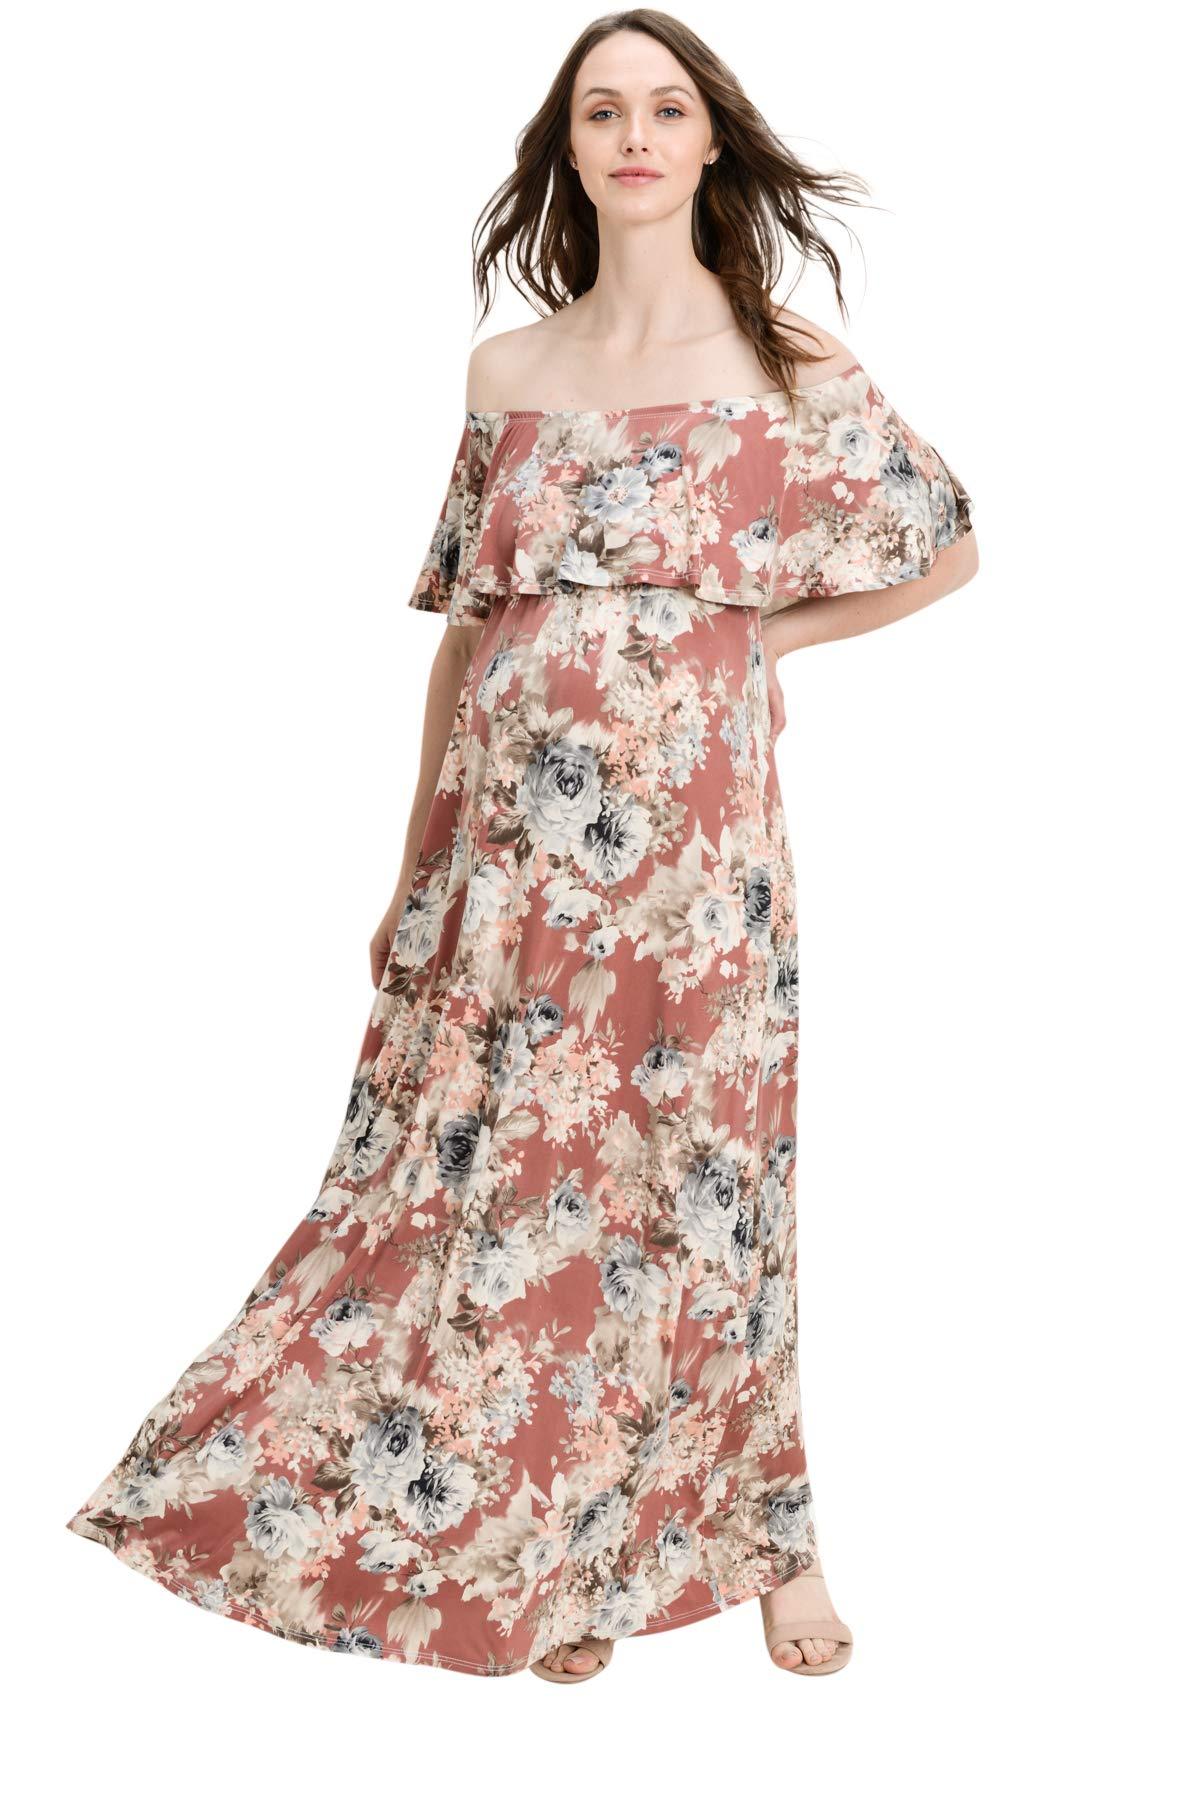 Hello MIZ Women's Ruffle Off The Shoulder Maxi Maternity Dress - Made in USA (Rust Flower, XL)